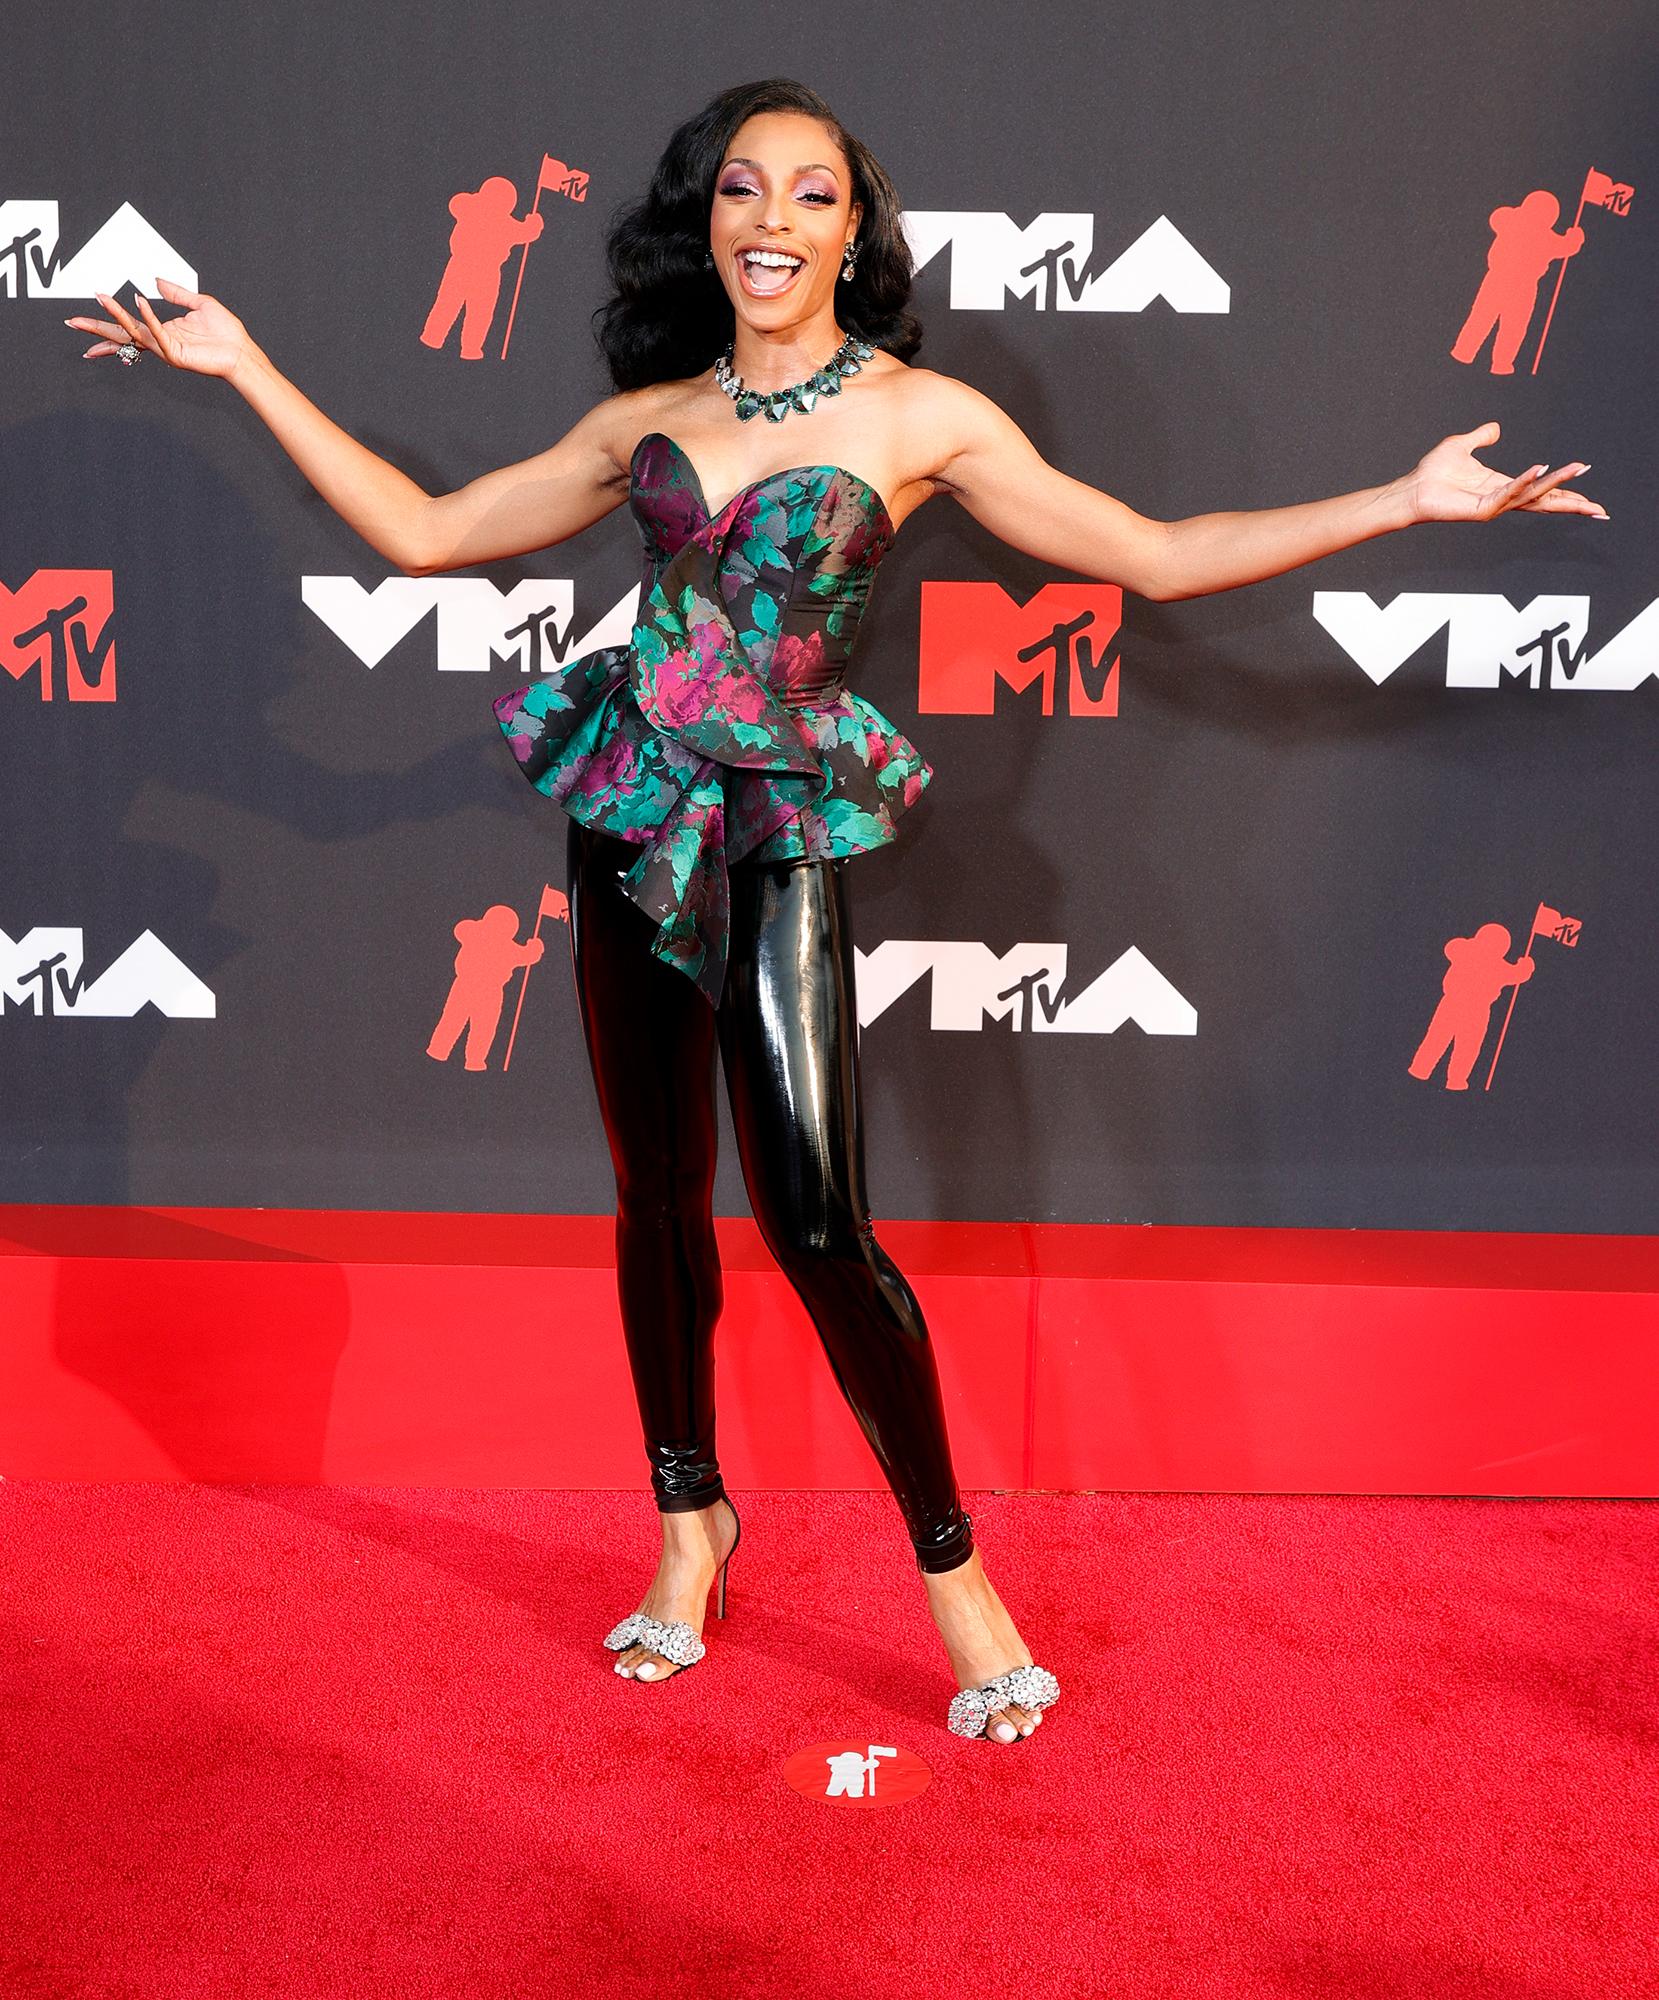 Jamila Mustafa arrives at the 2021 MTV Video Music Awards